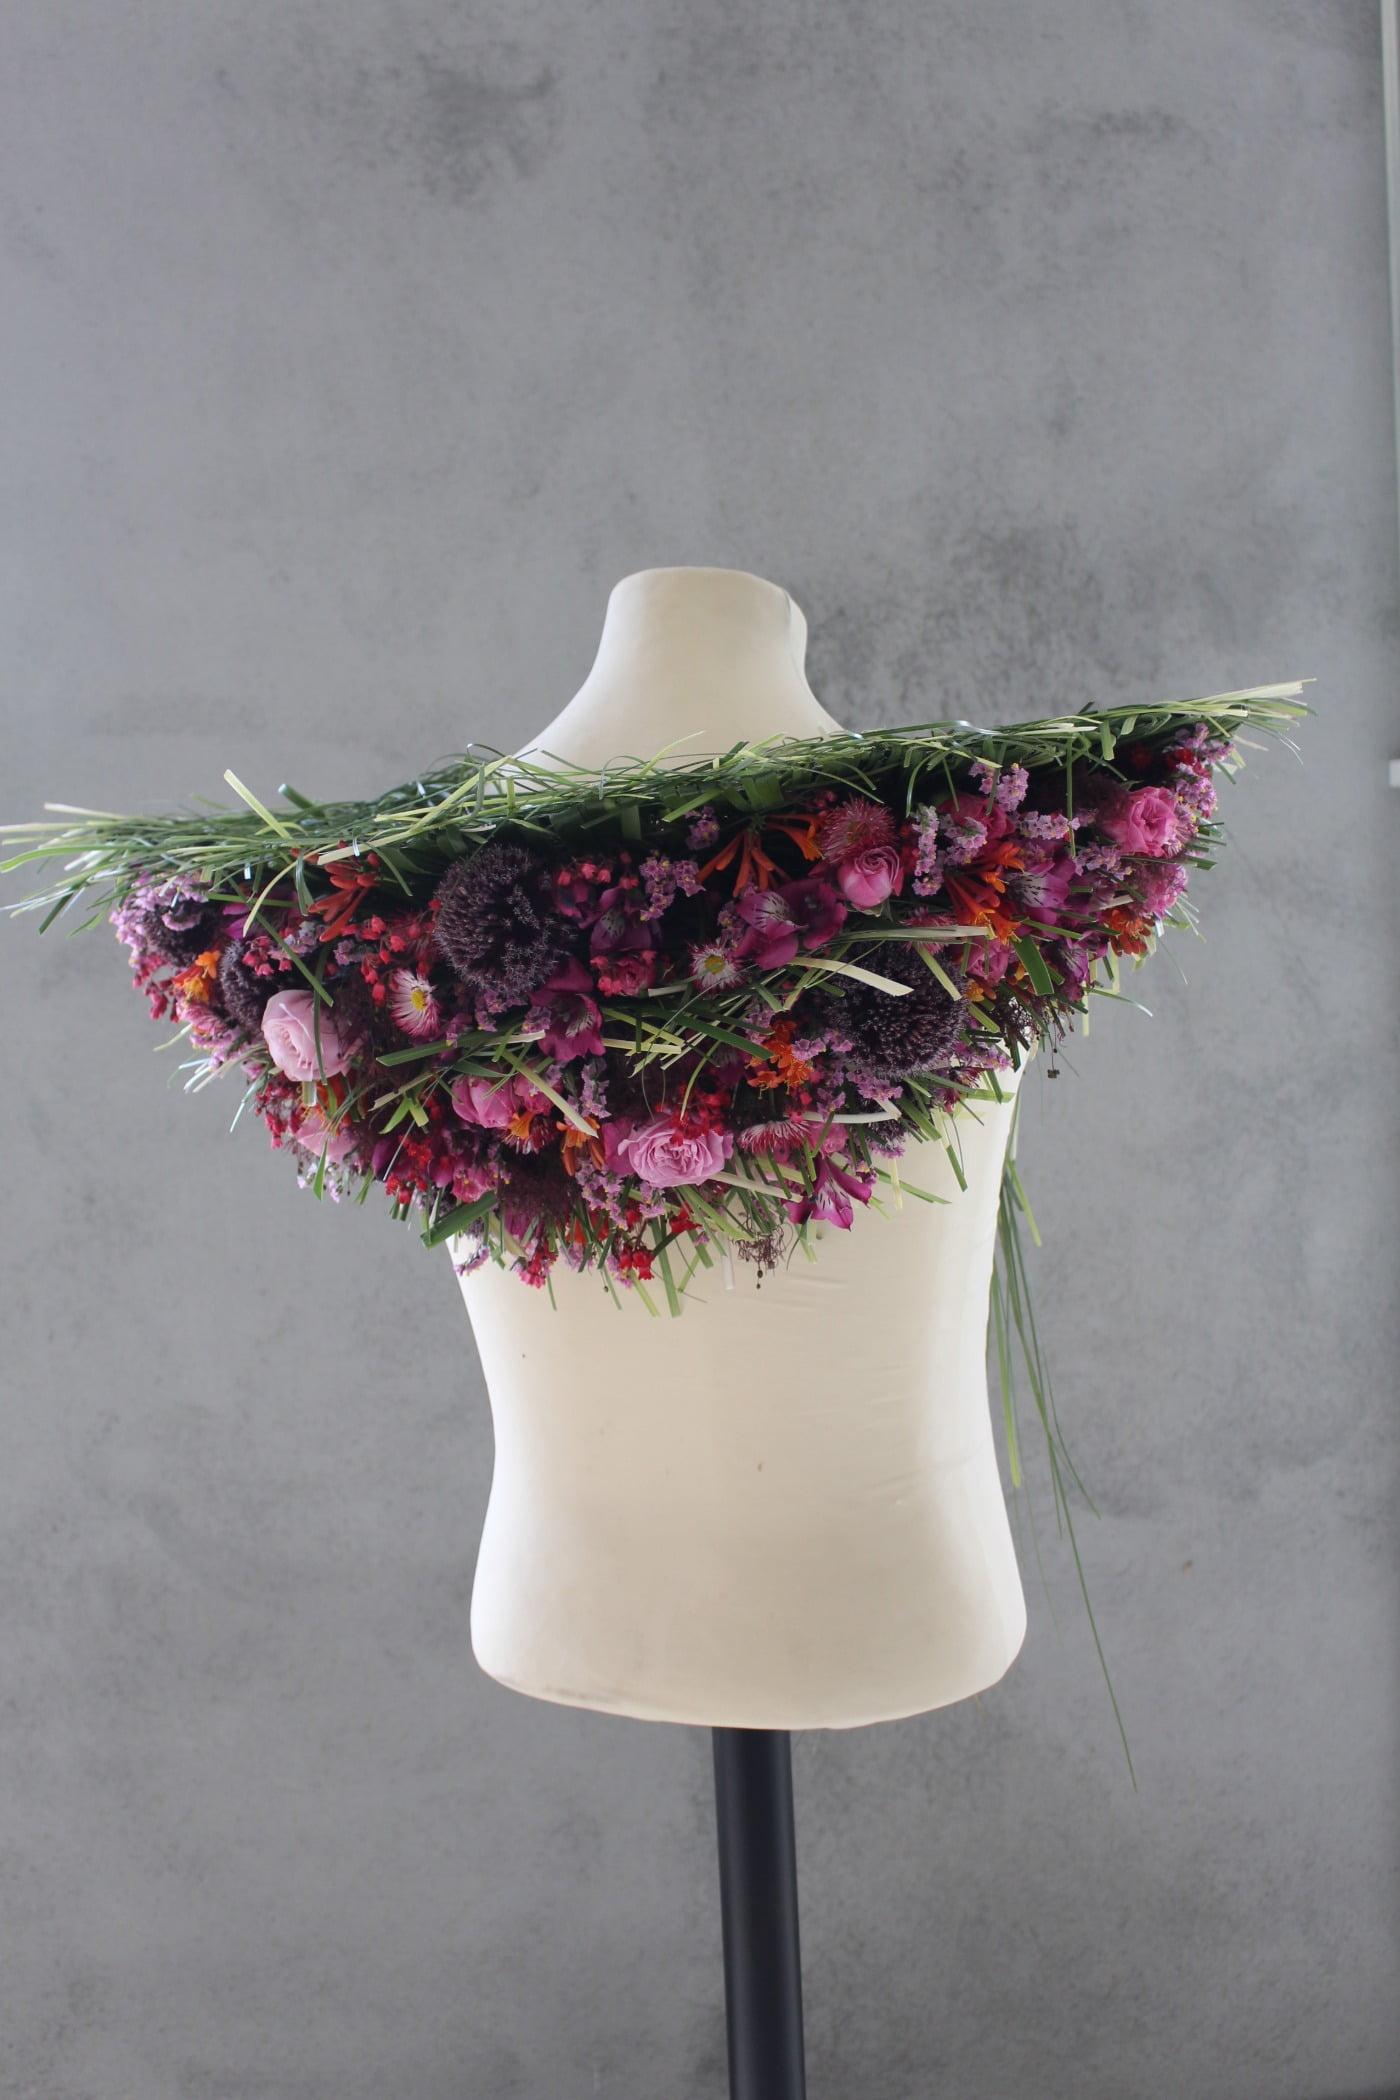 Creative arts, Floral design, Costume accessory, Lavender, Mannequin, Magenta, Petal